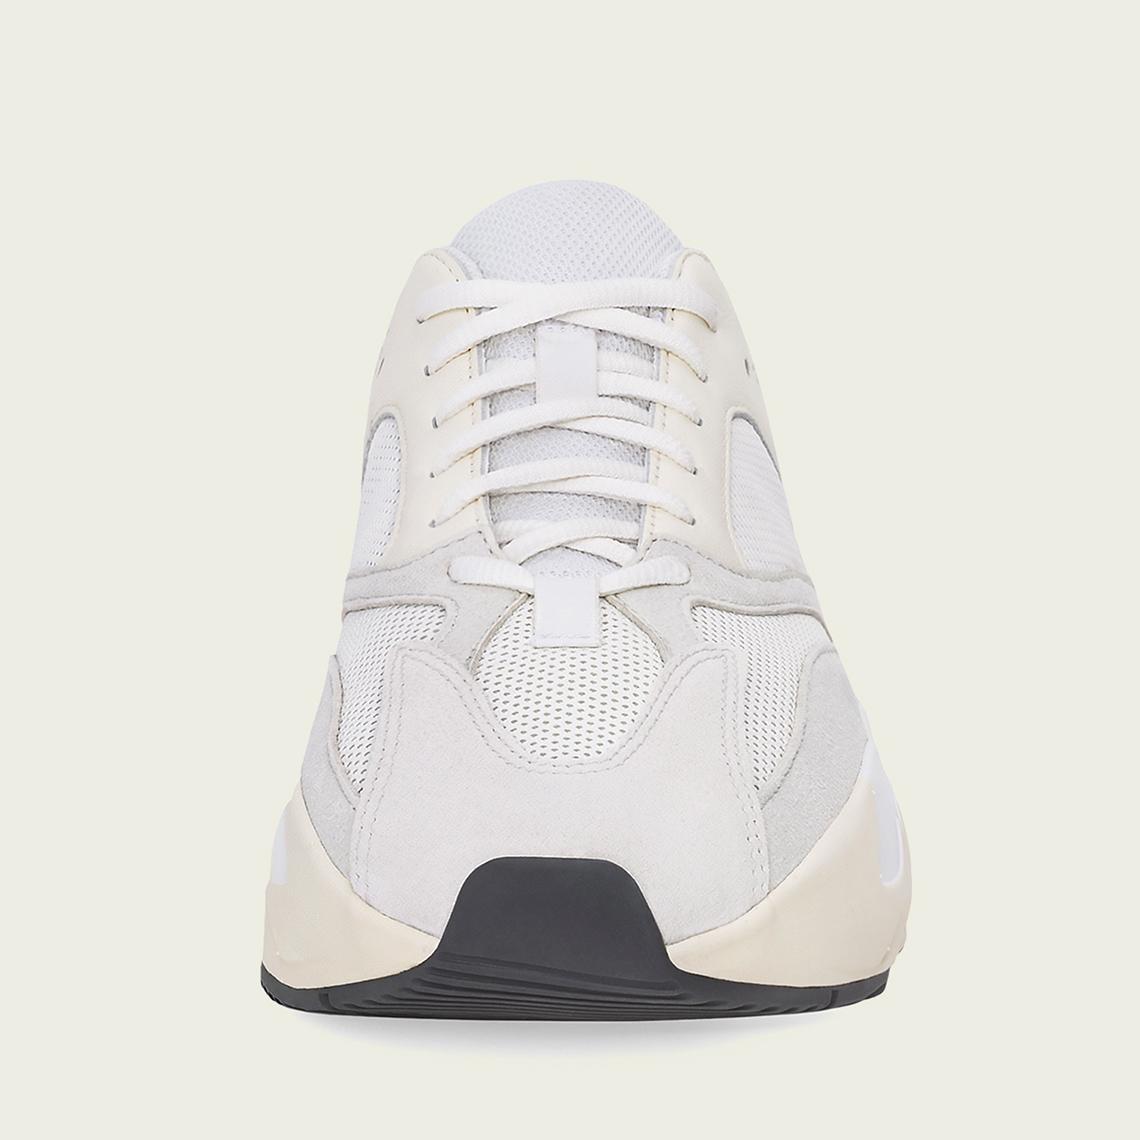 sale retailer 30104 4c67e adidas Yeezy 700 Analog - Where To Buy   SneakerNews.com